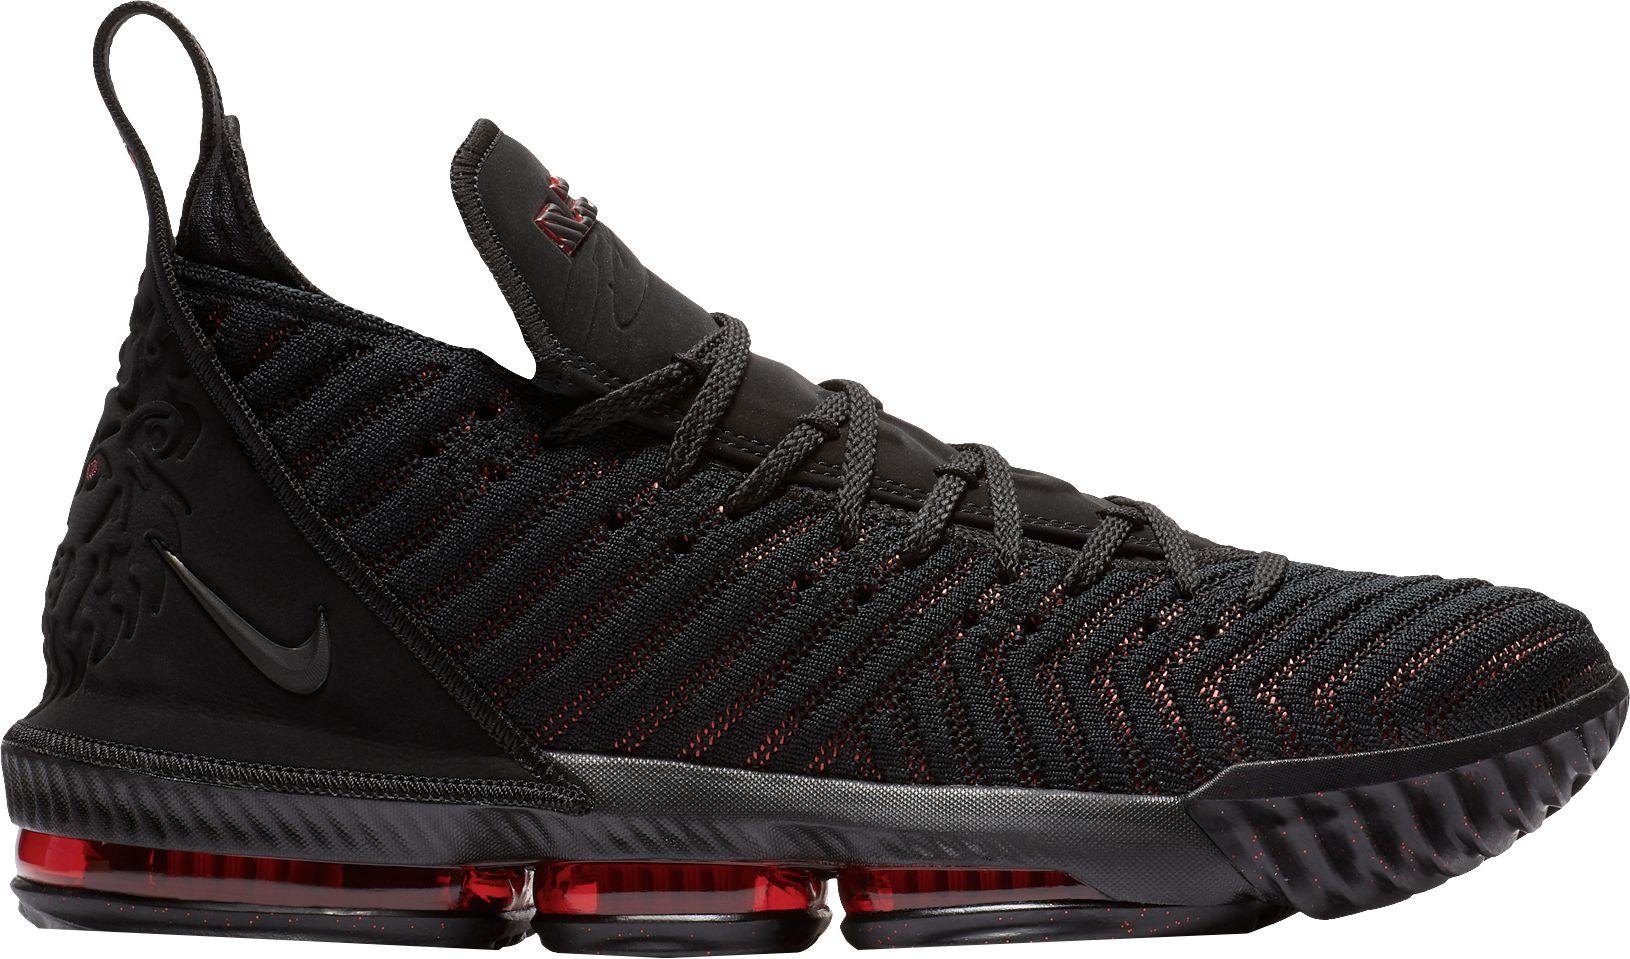 fddd07f369af Nike LeBron 16 Basketball Shoes